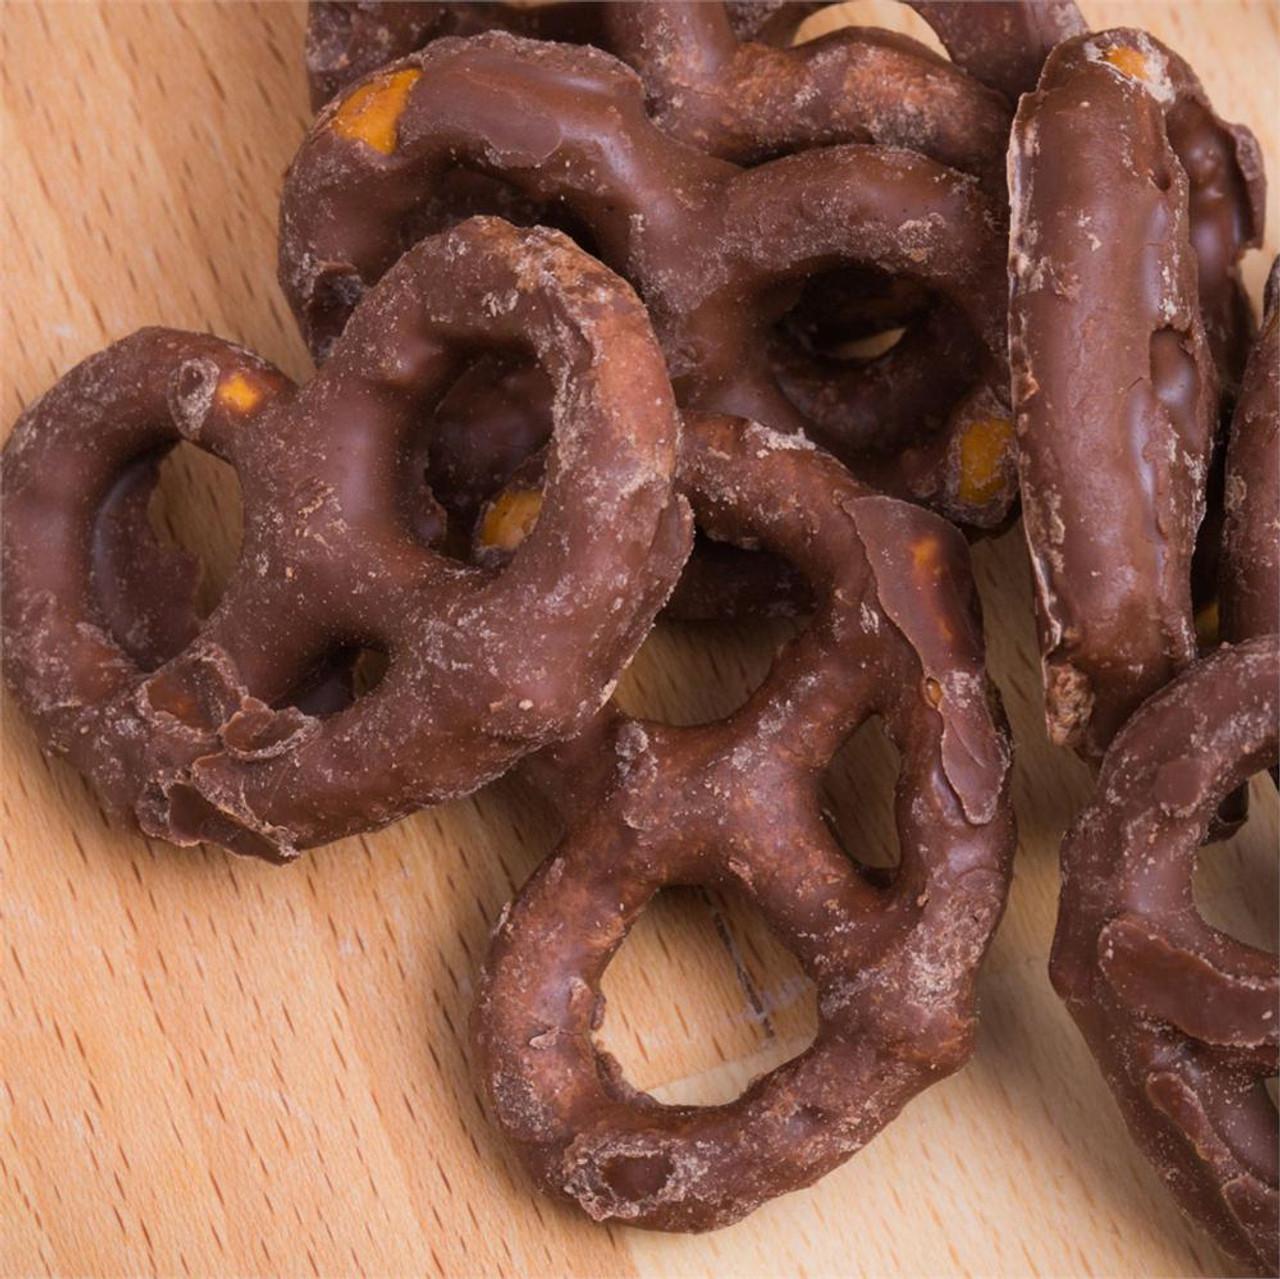 Chocolate Covered Pretzels 4oz